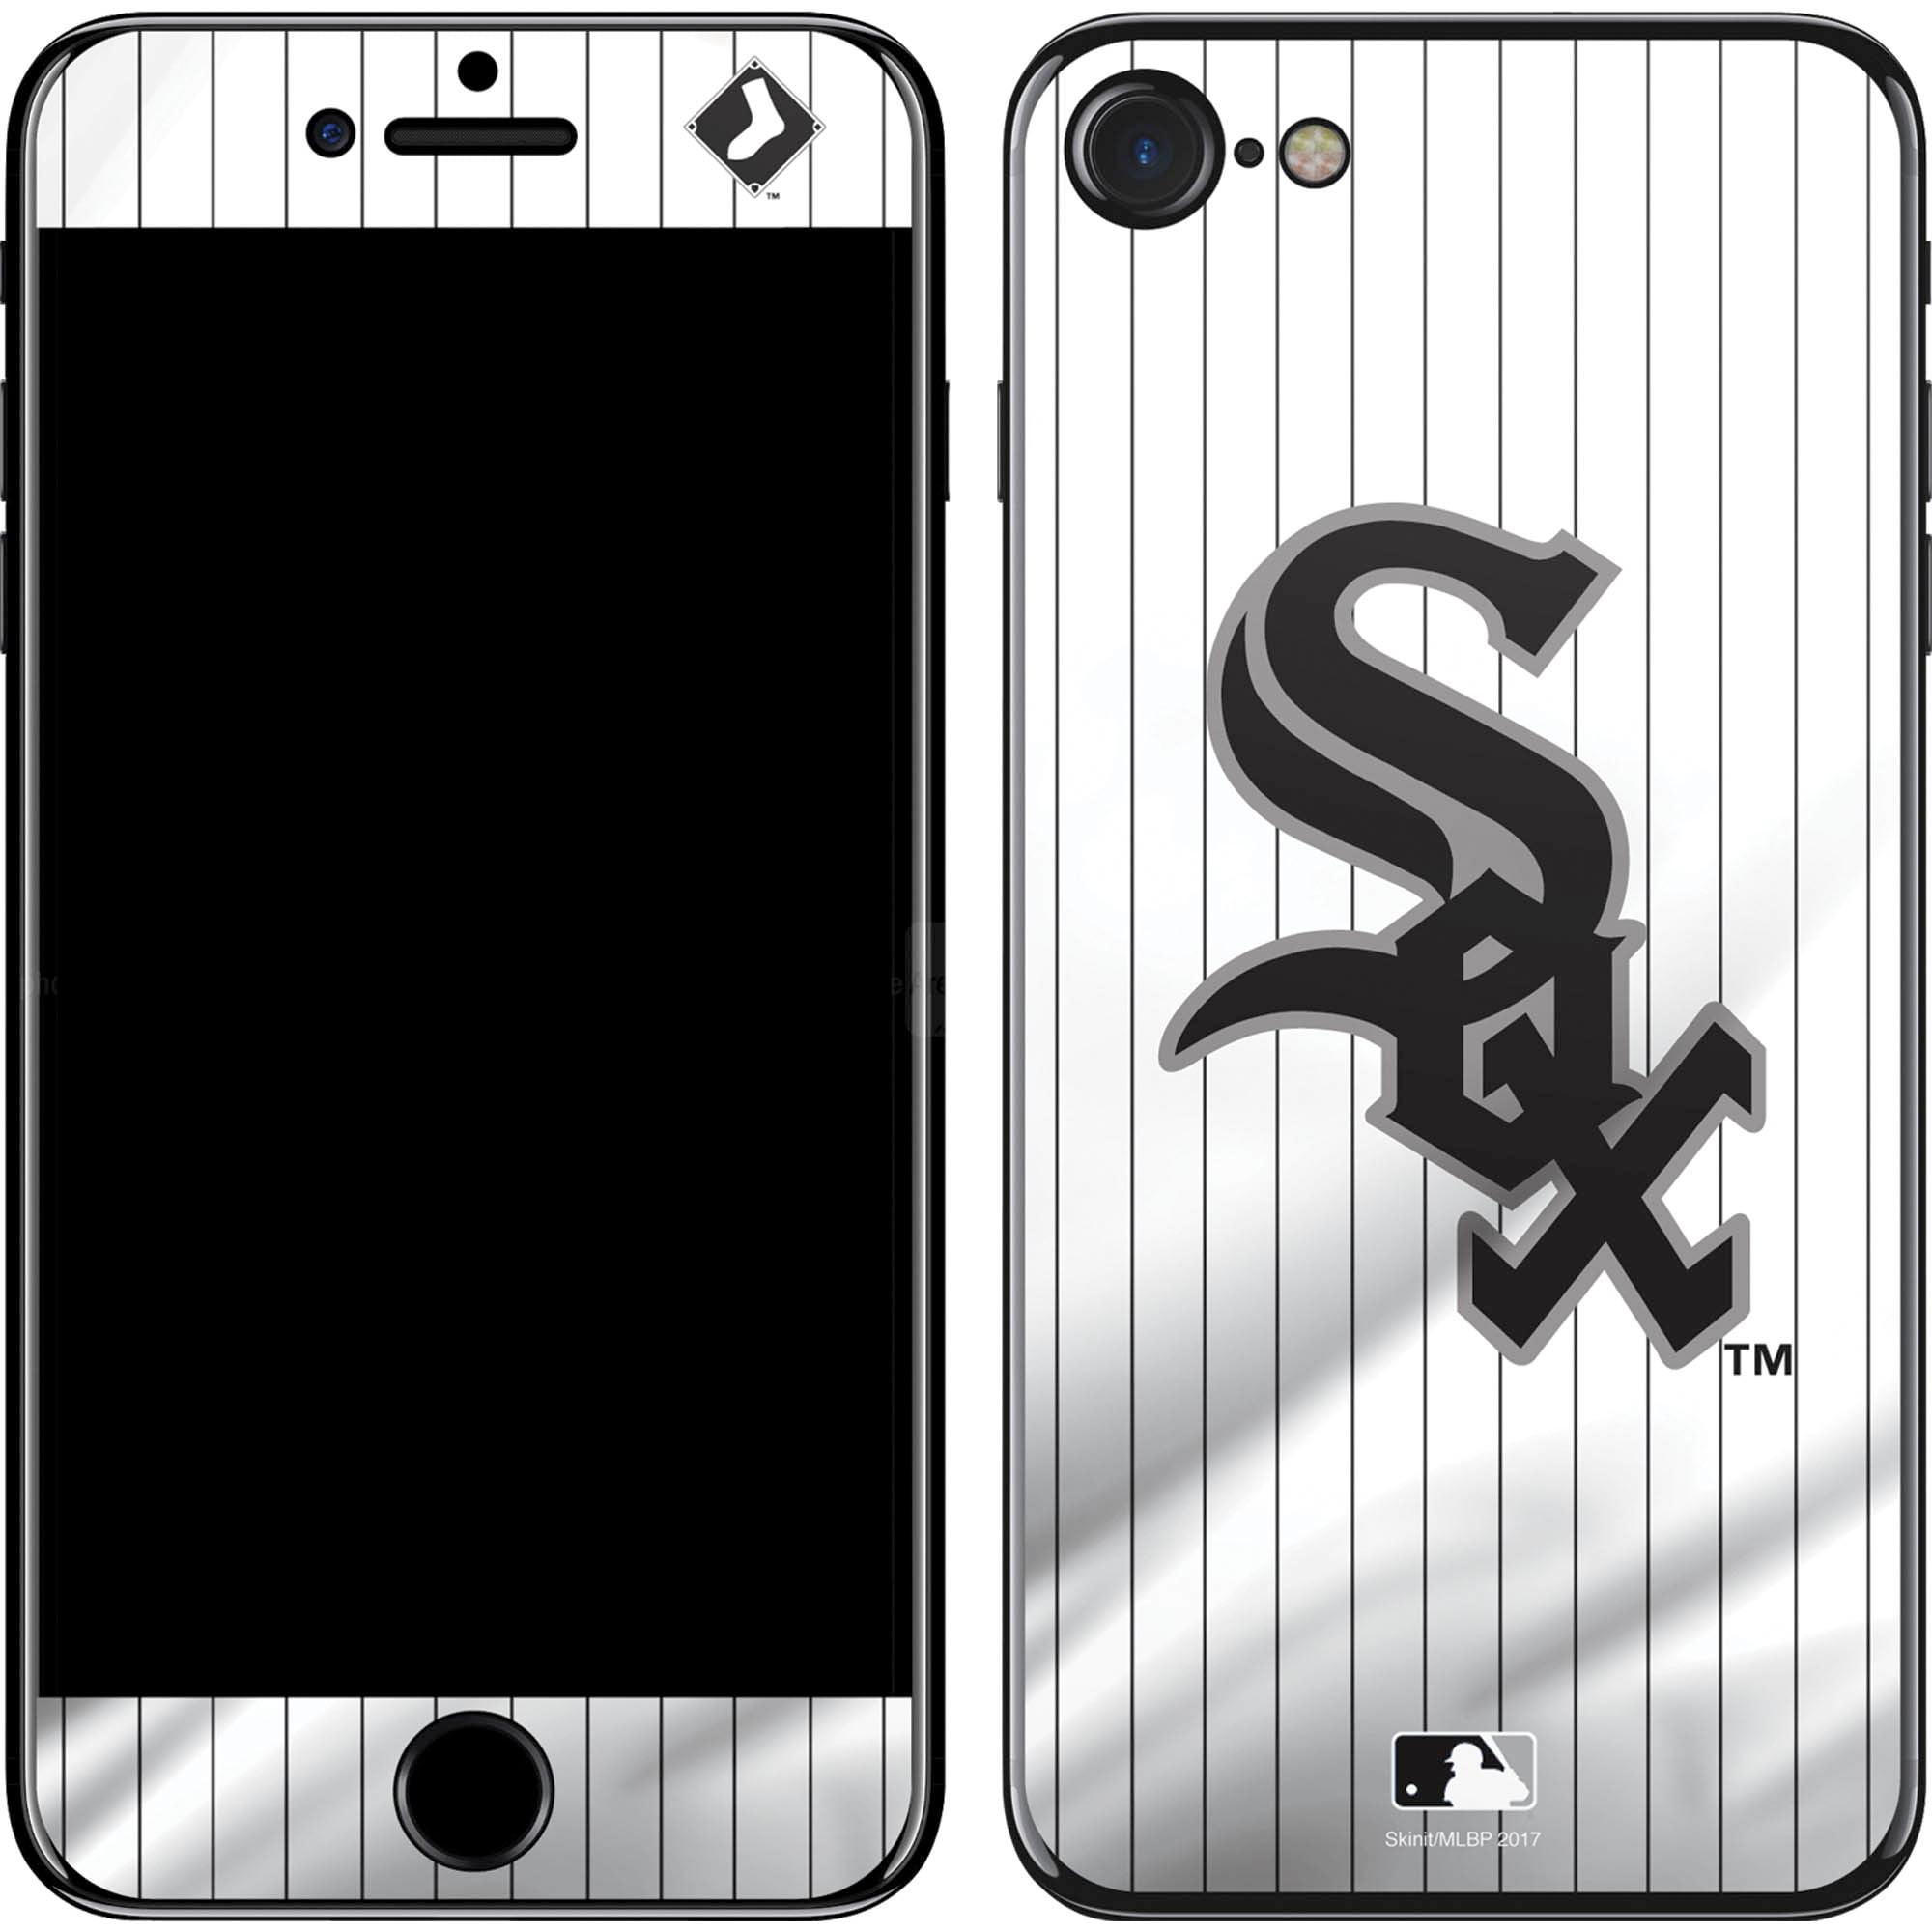 Chicago White Sox Skinit iPhone 7 Skin - No Size